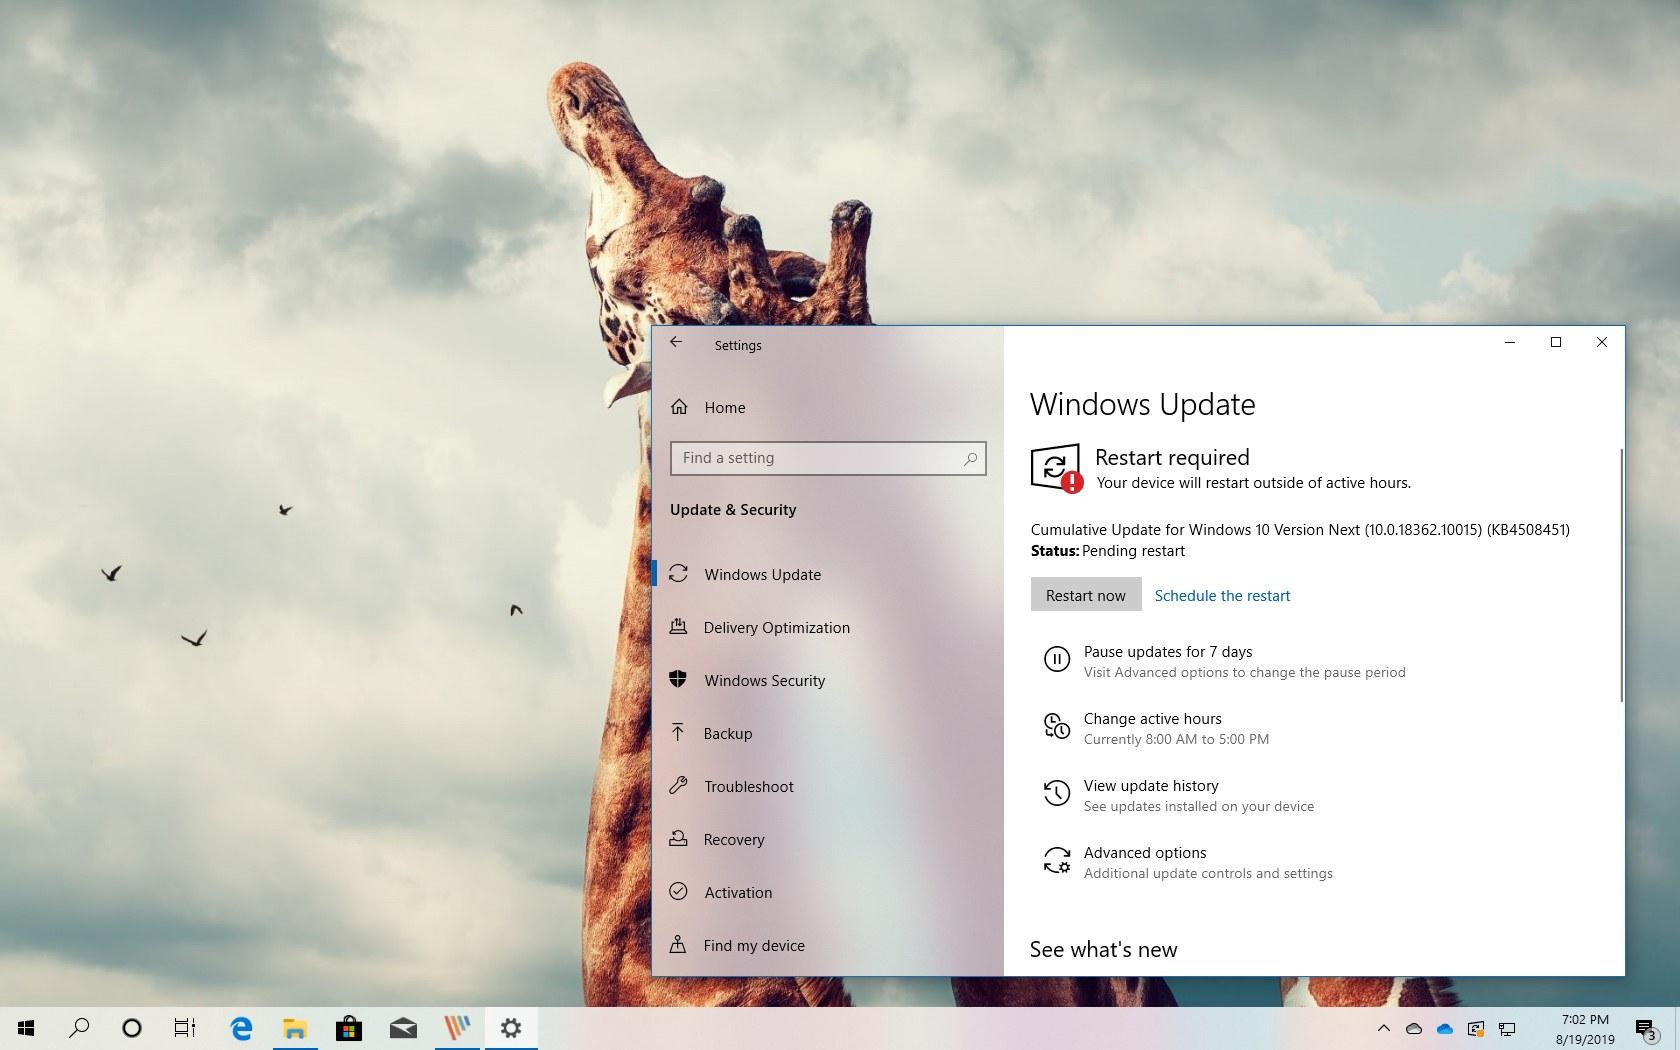 Windows 10 build 18362.10015 download